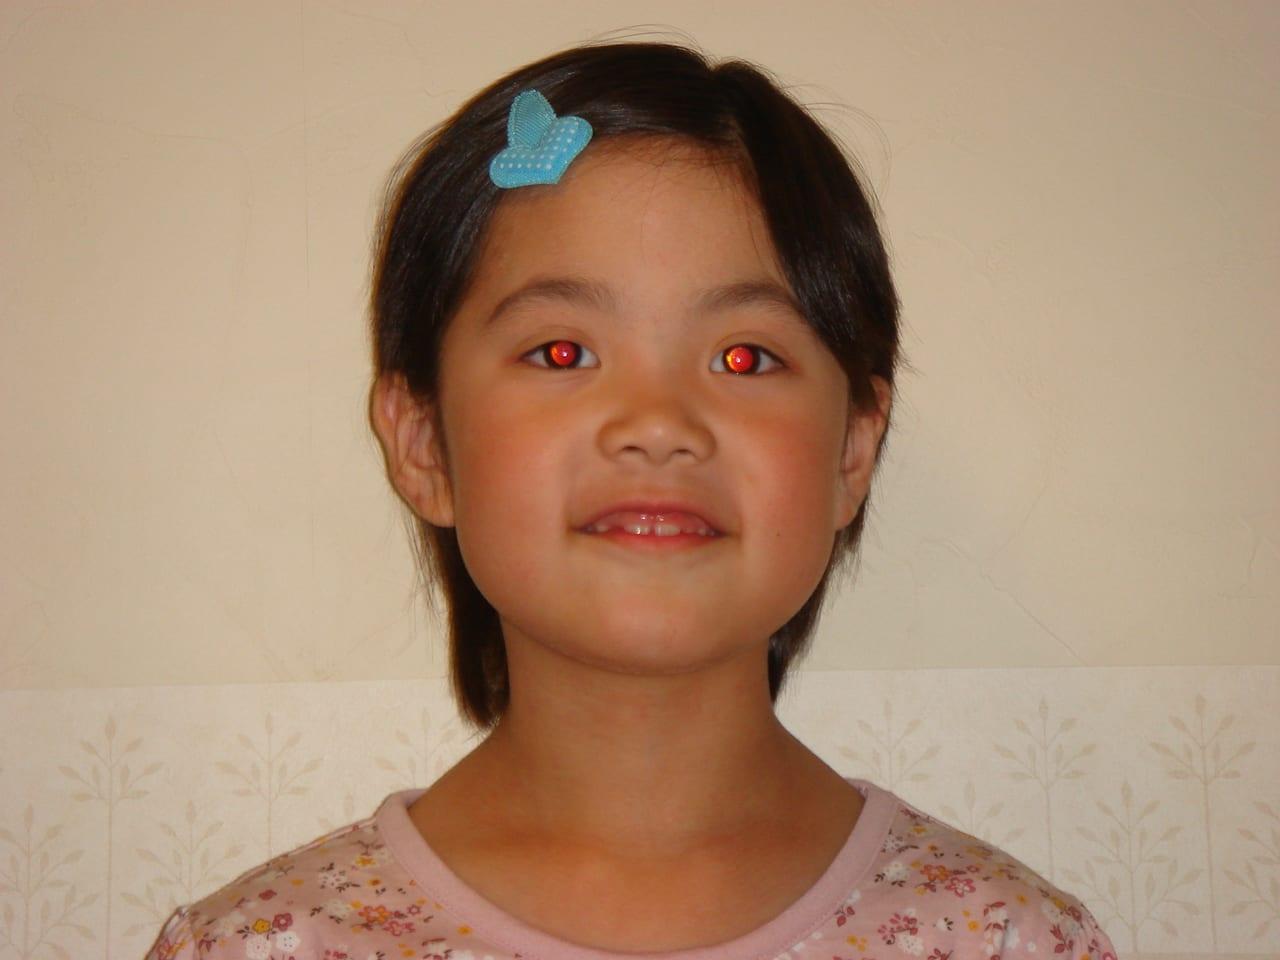 My daughter looks like TOK715....